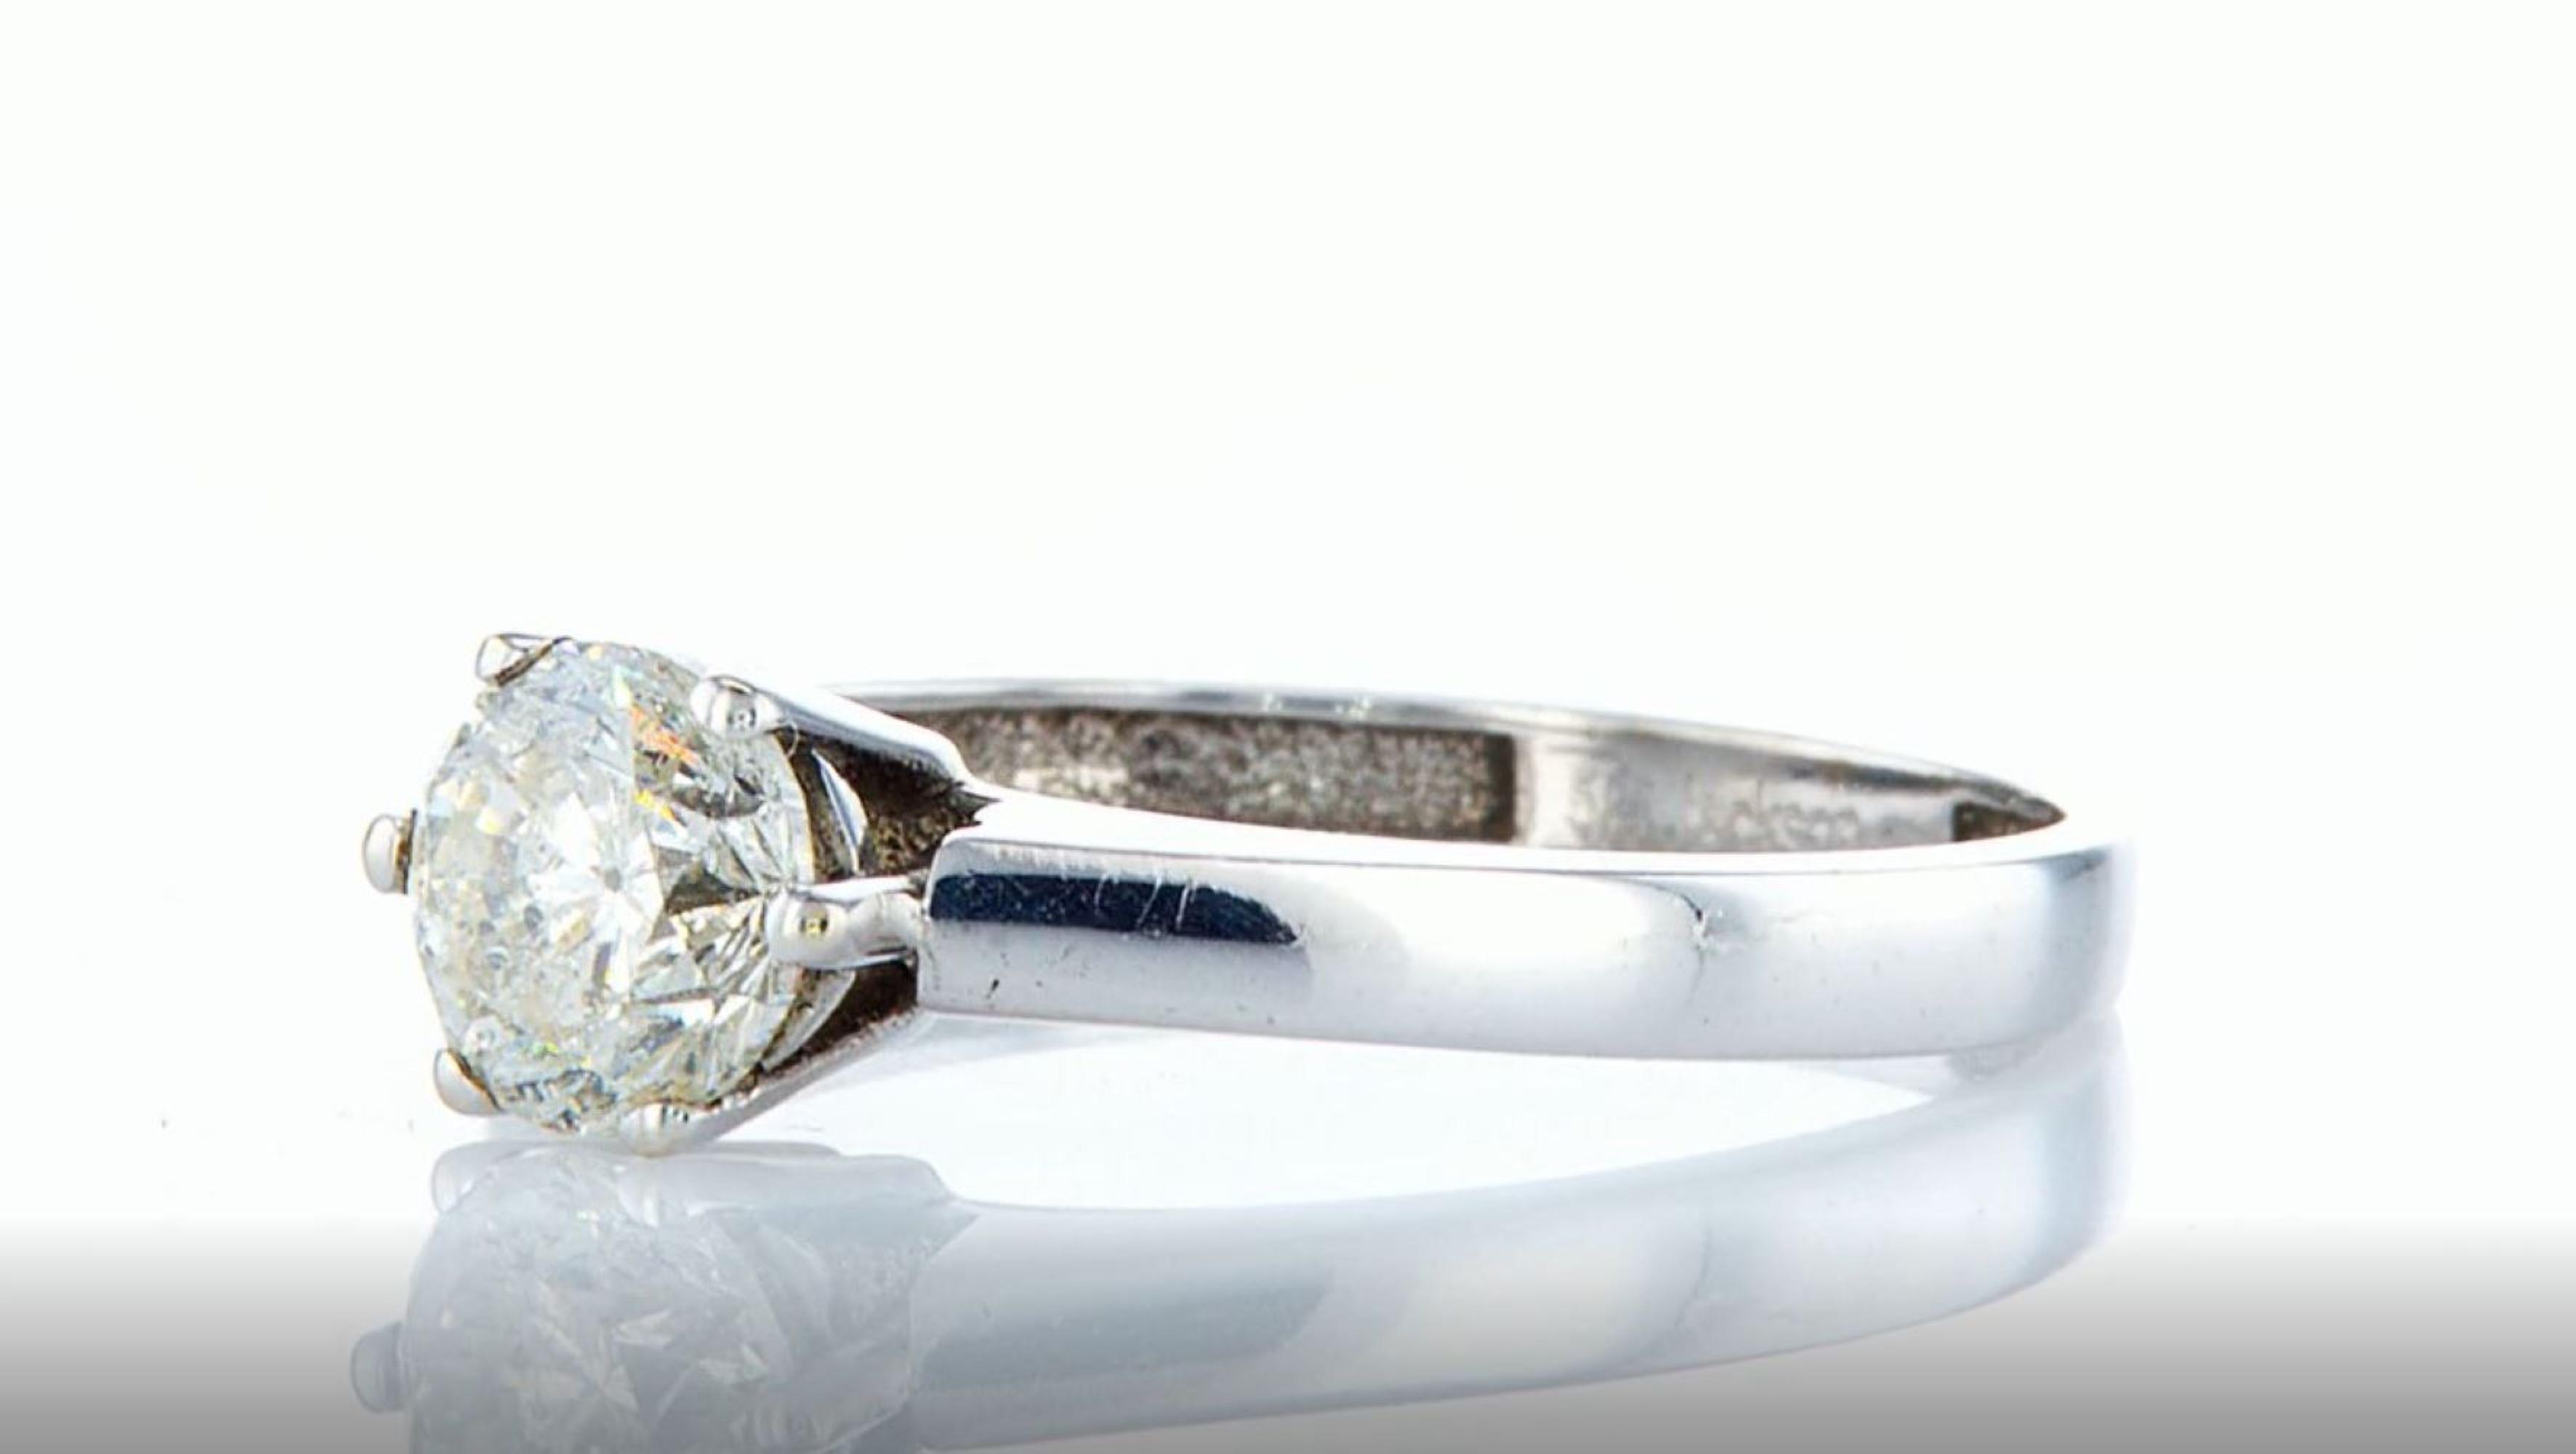 14K White gold ring 1.05CTW - Image 2 of 7